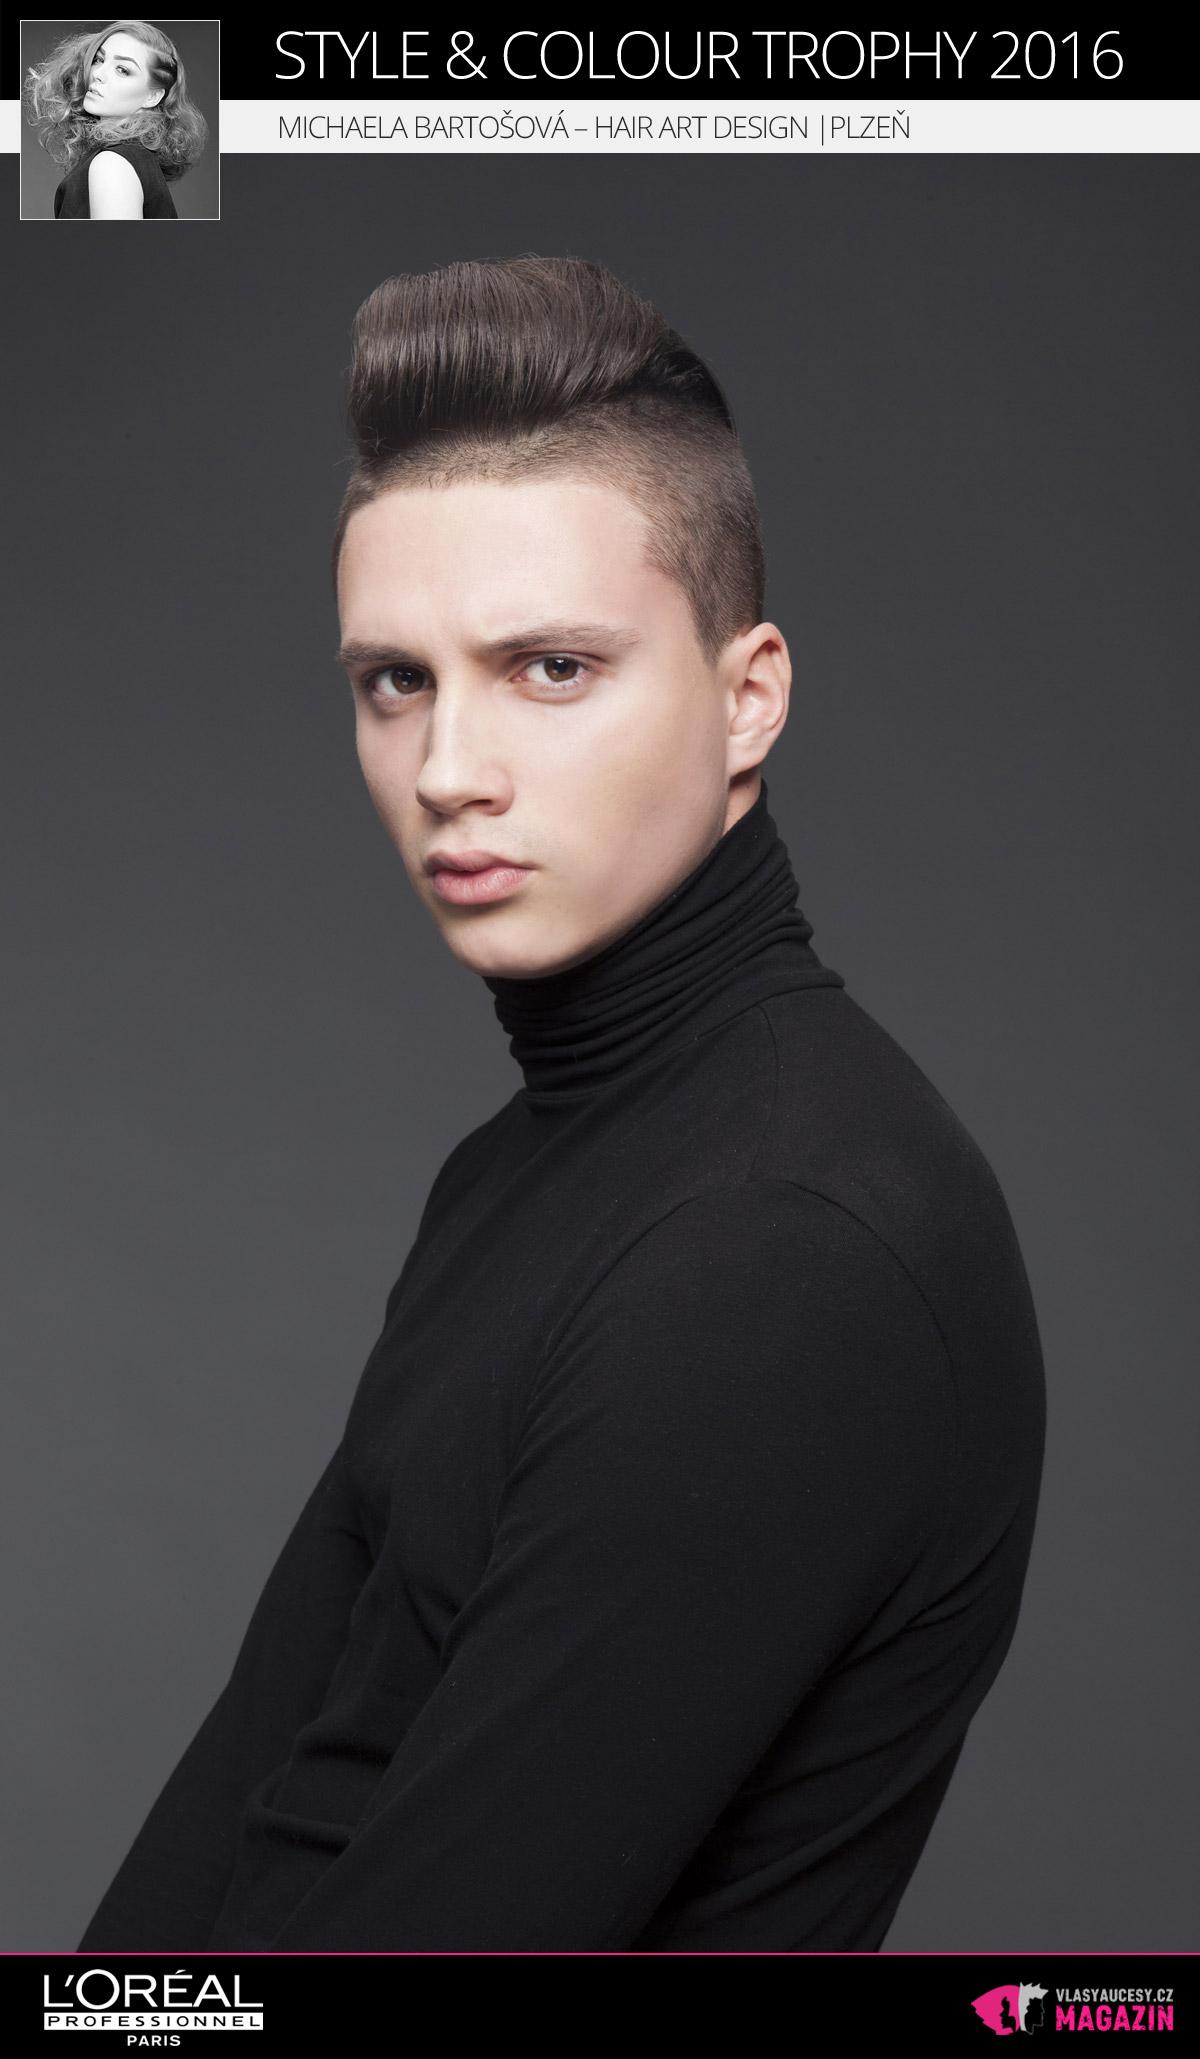 Michaela Bartošová – Hair Art Design, Plzeň   L'Oréal Style & Colour Trophy 2016